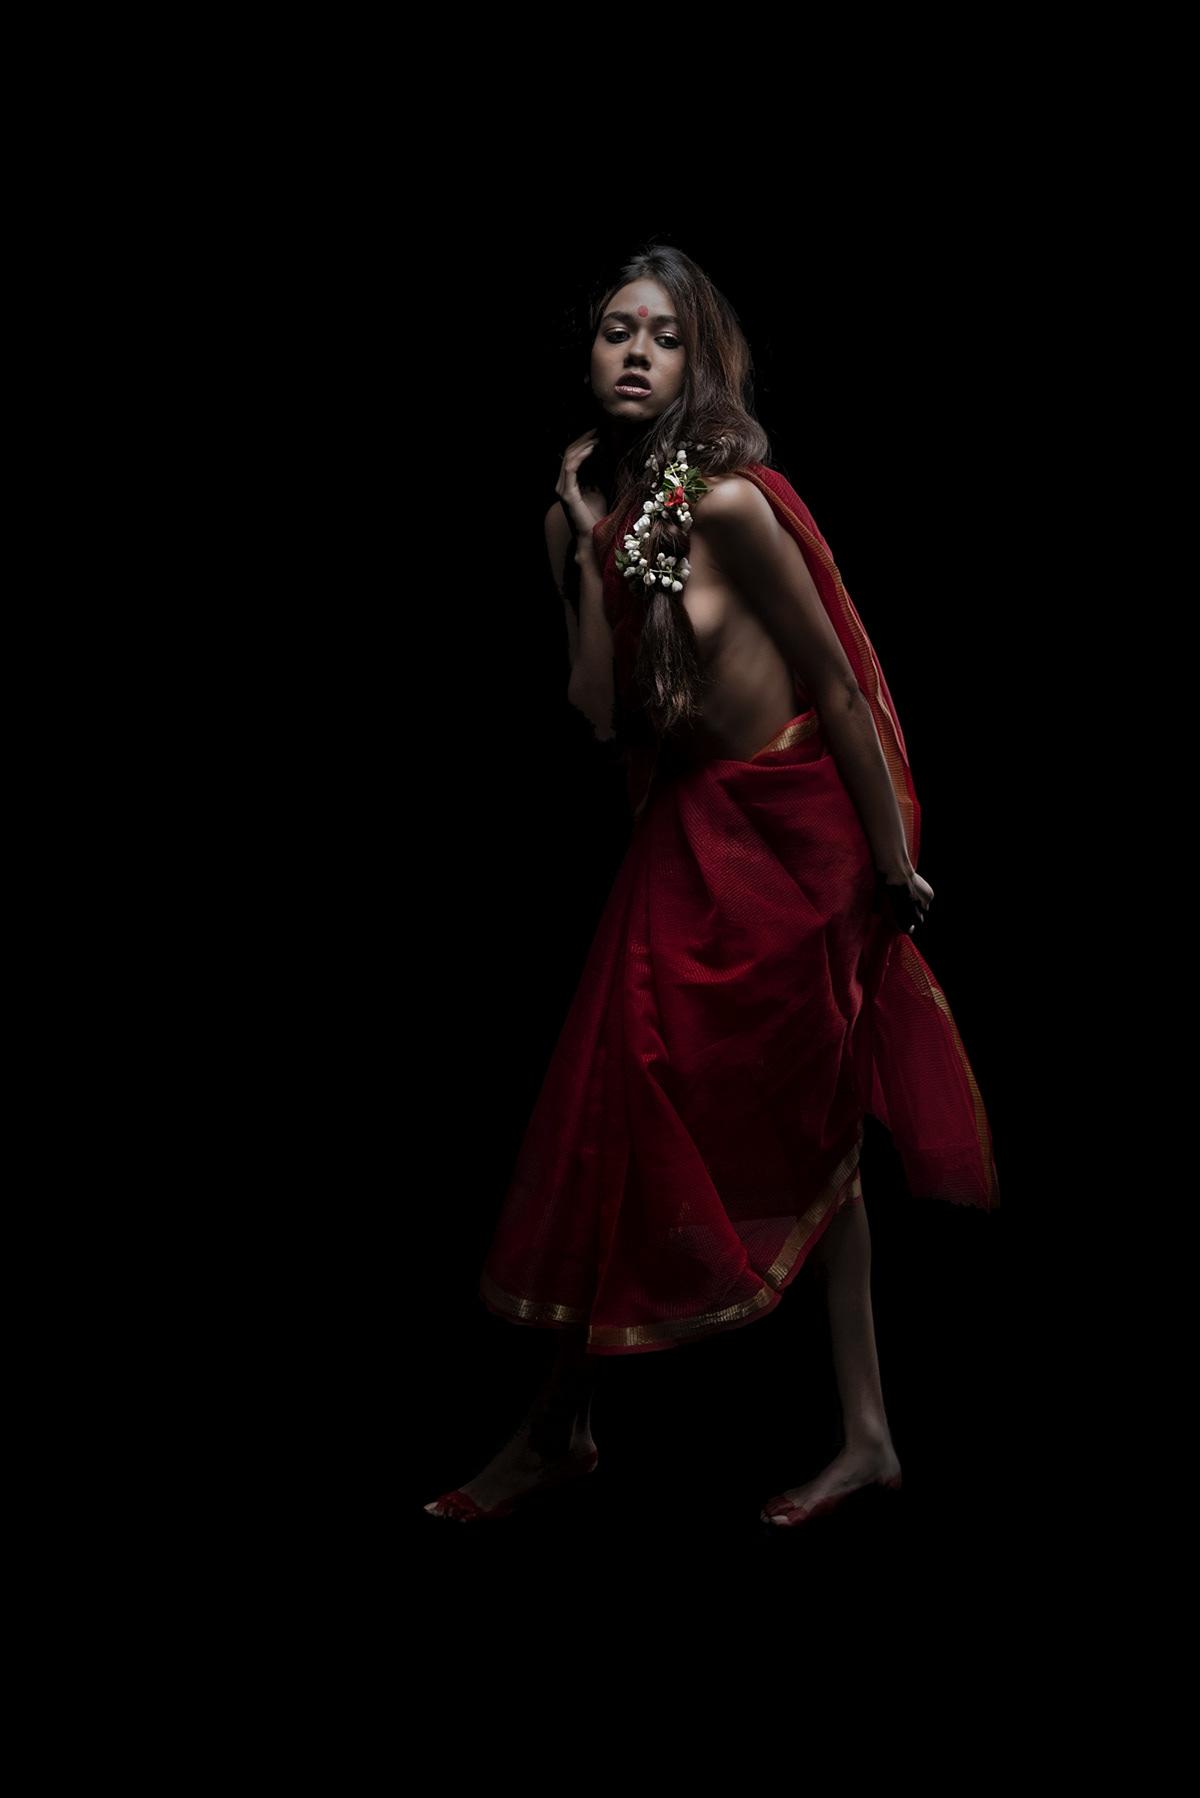 India beauty Female Model Sari tribal Ethnic bride bridal MUMBAI desire